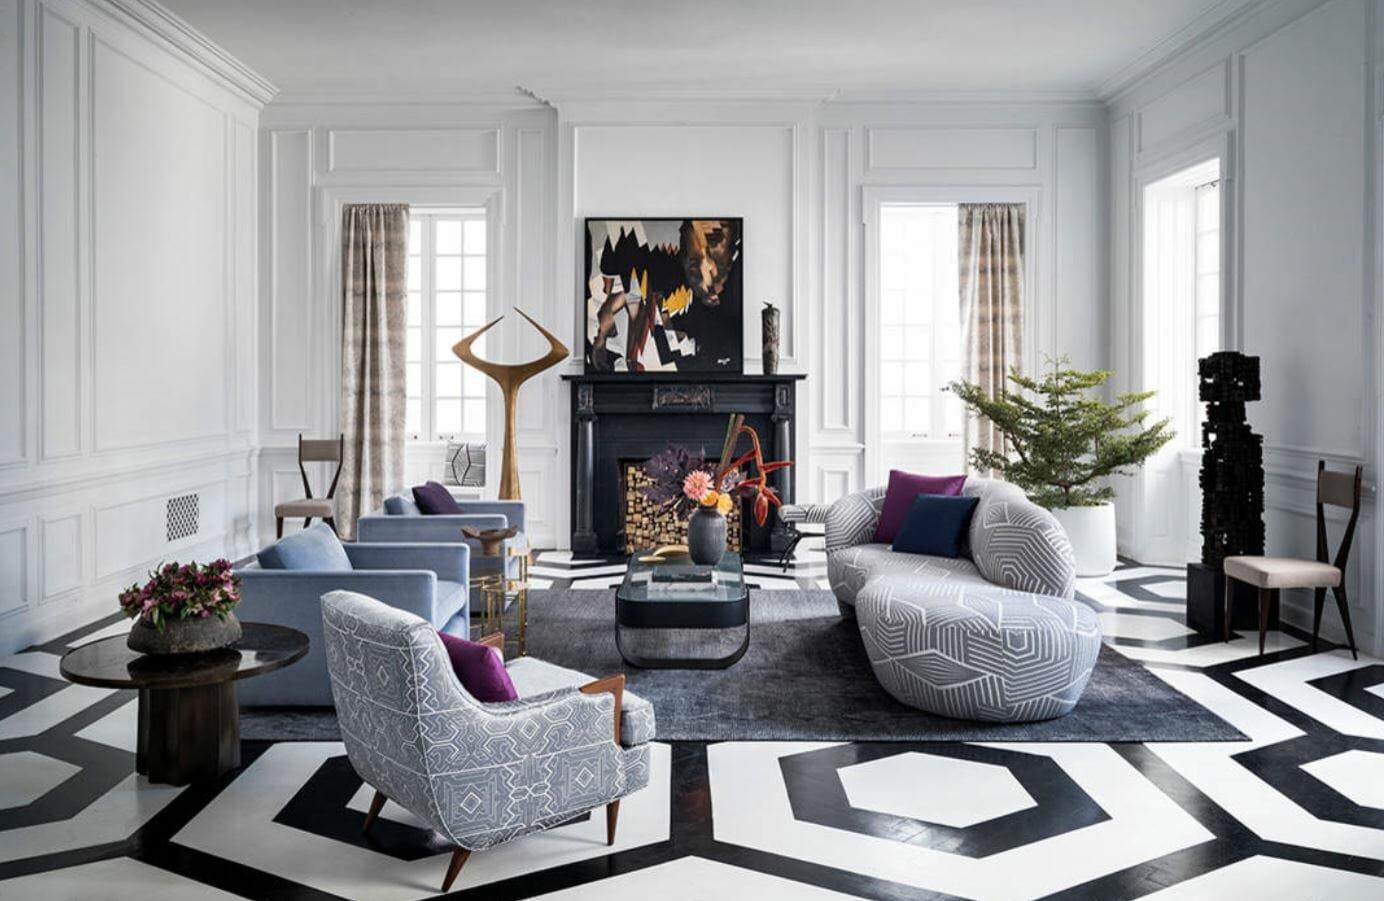 winter 2019 interior design trends round furniture